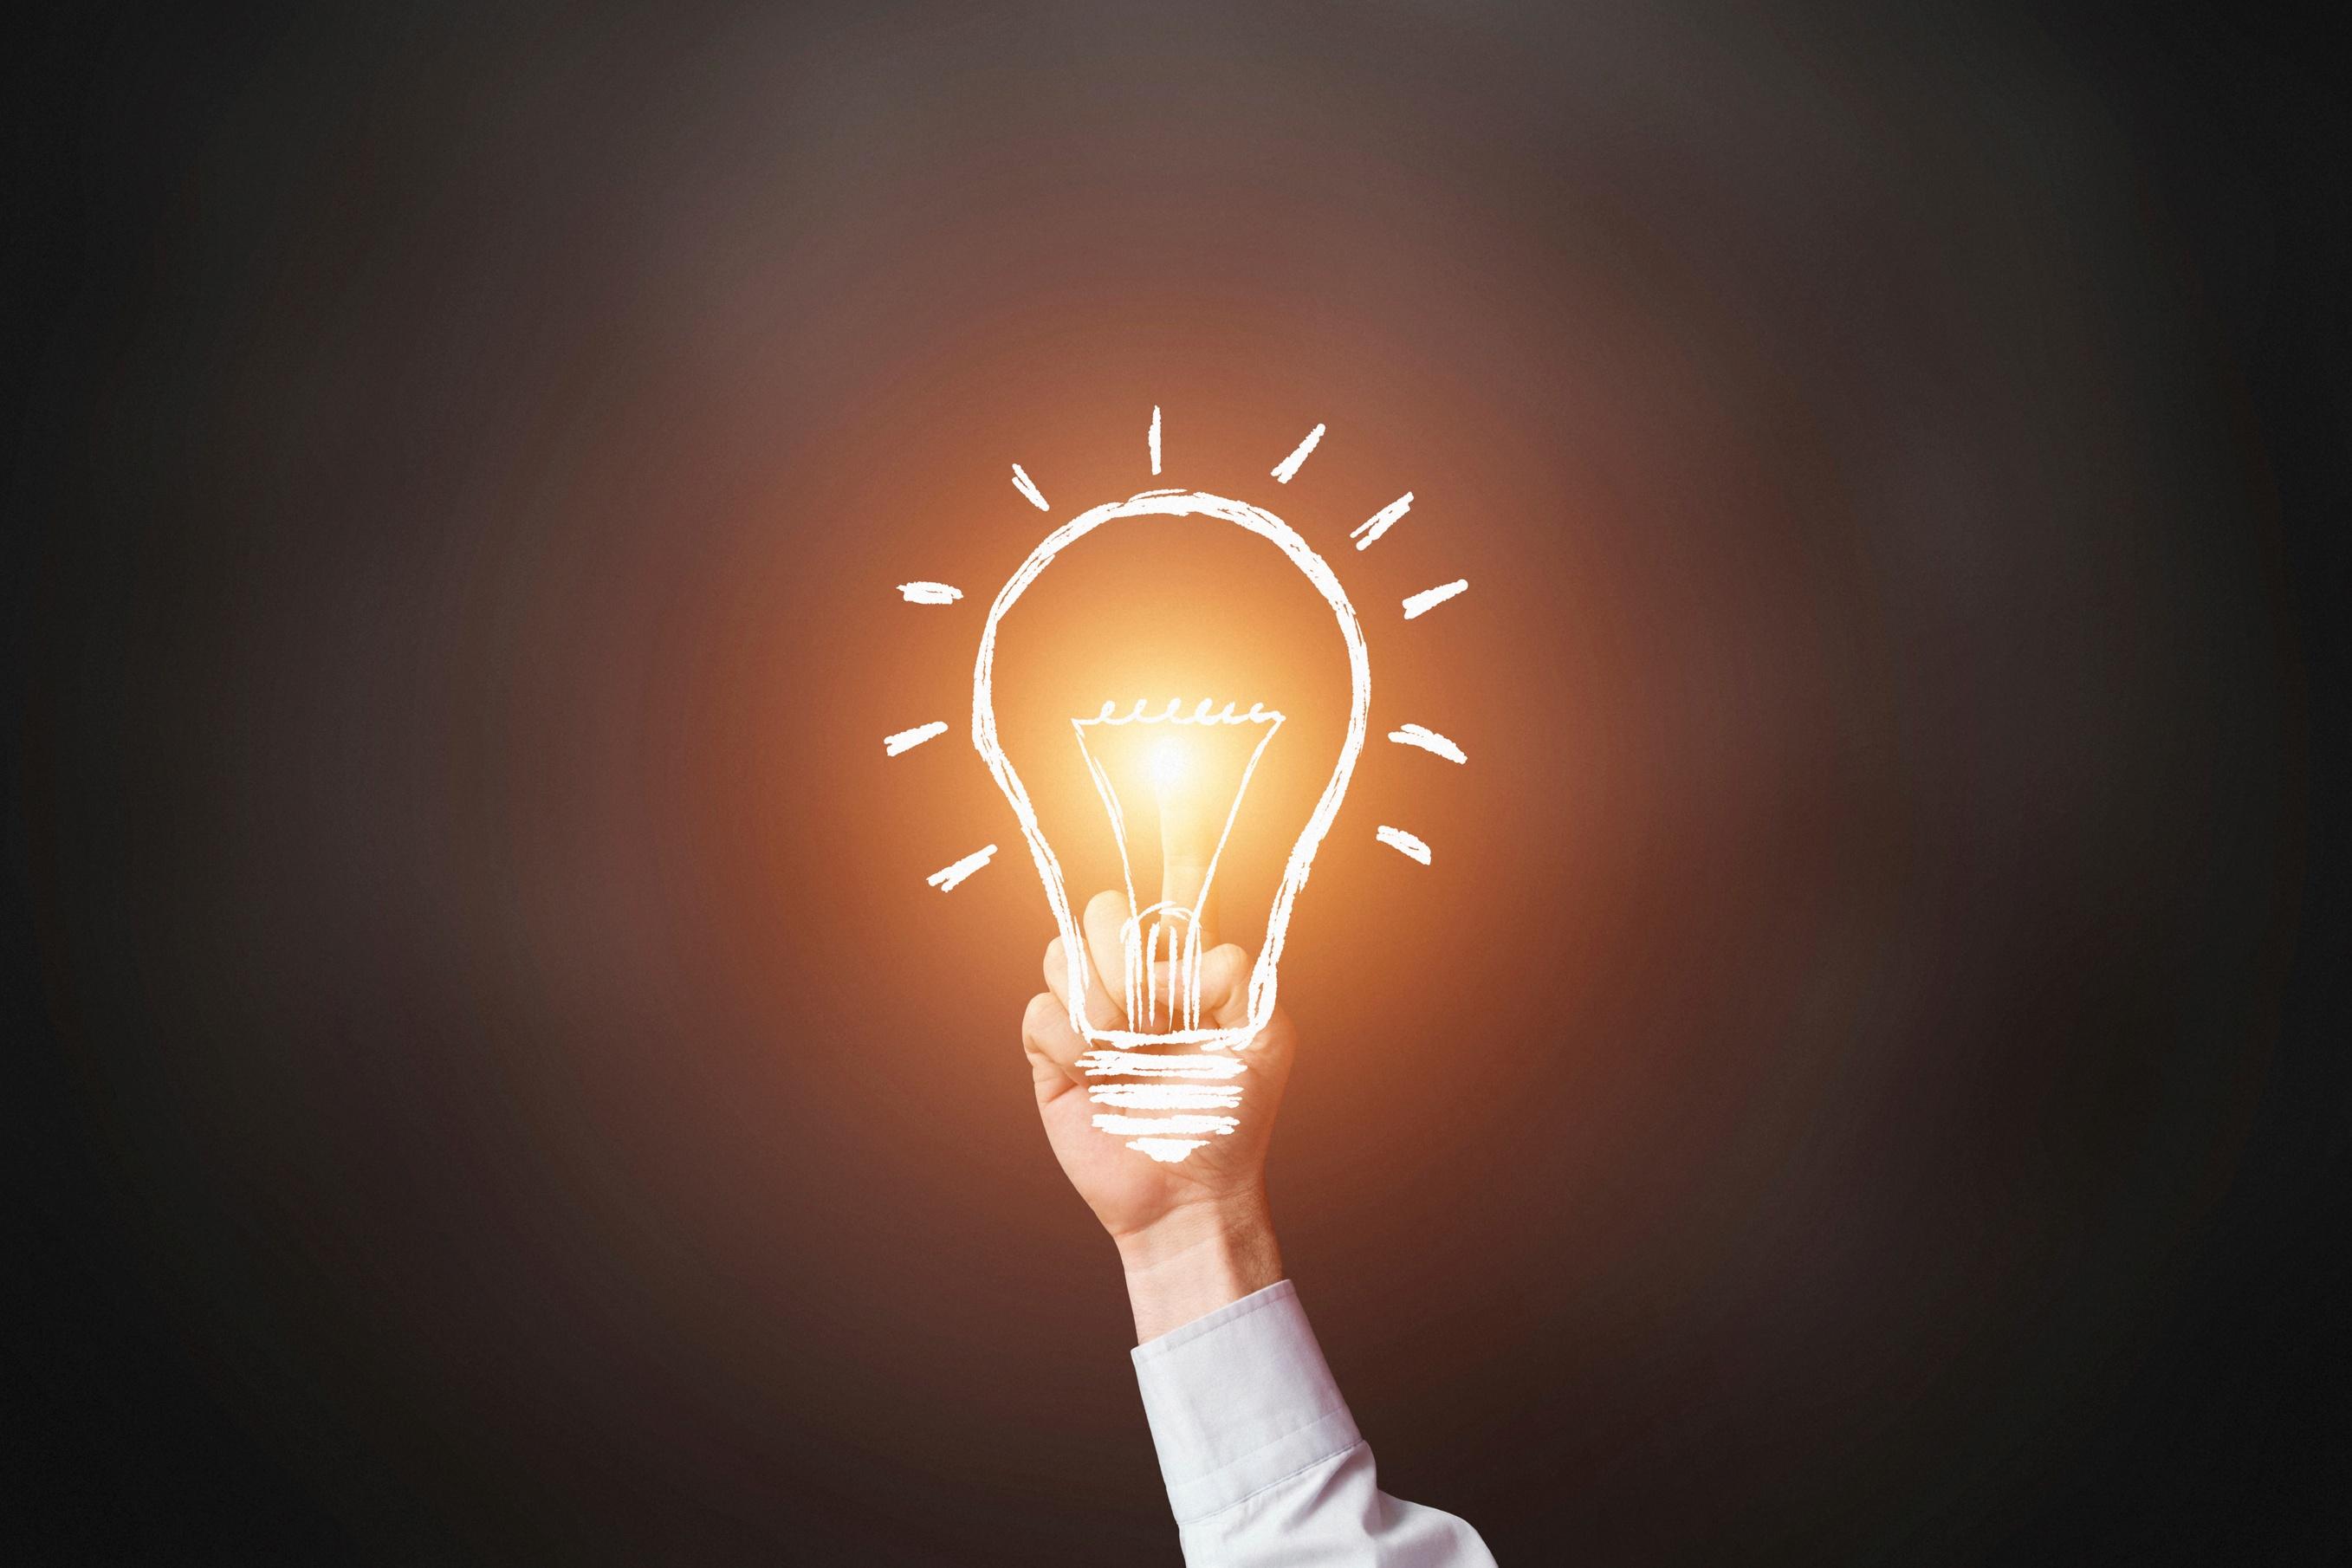 big_idea_light_bulb.jpg